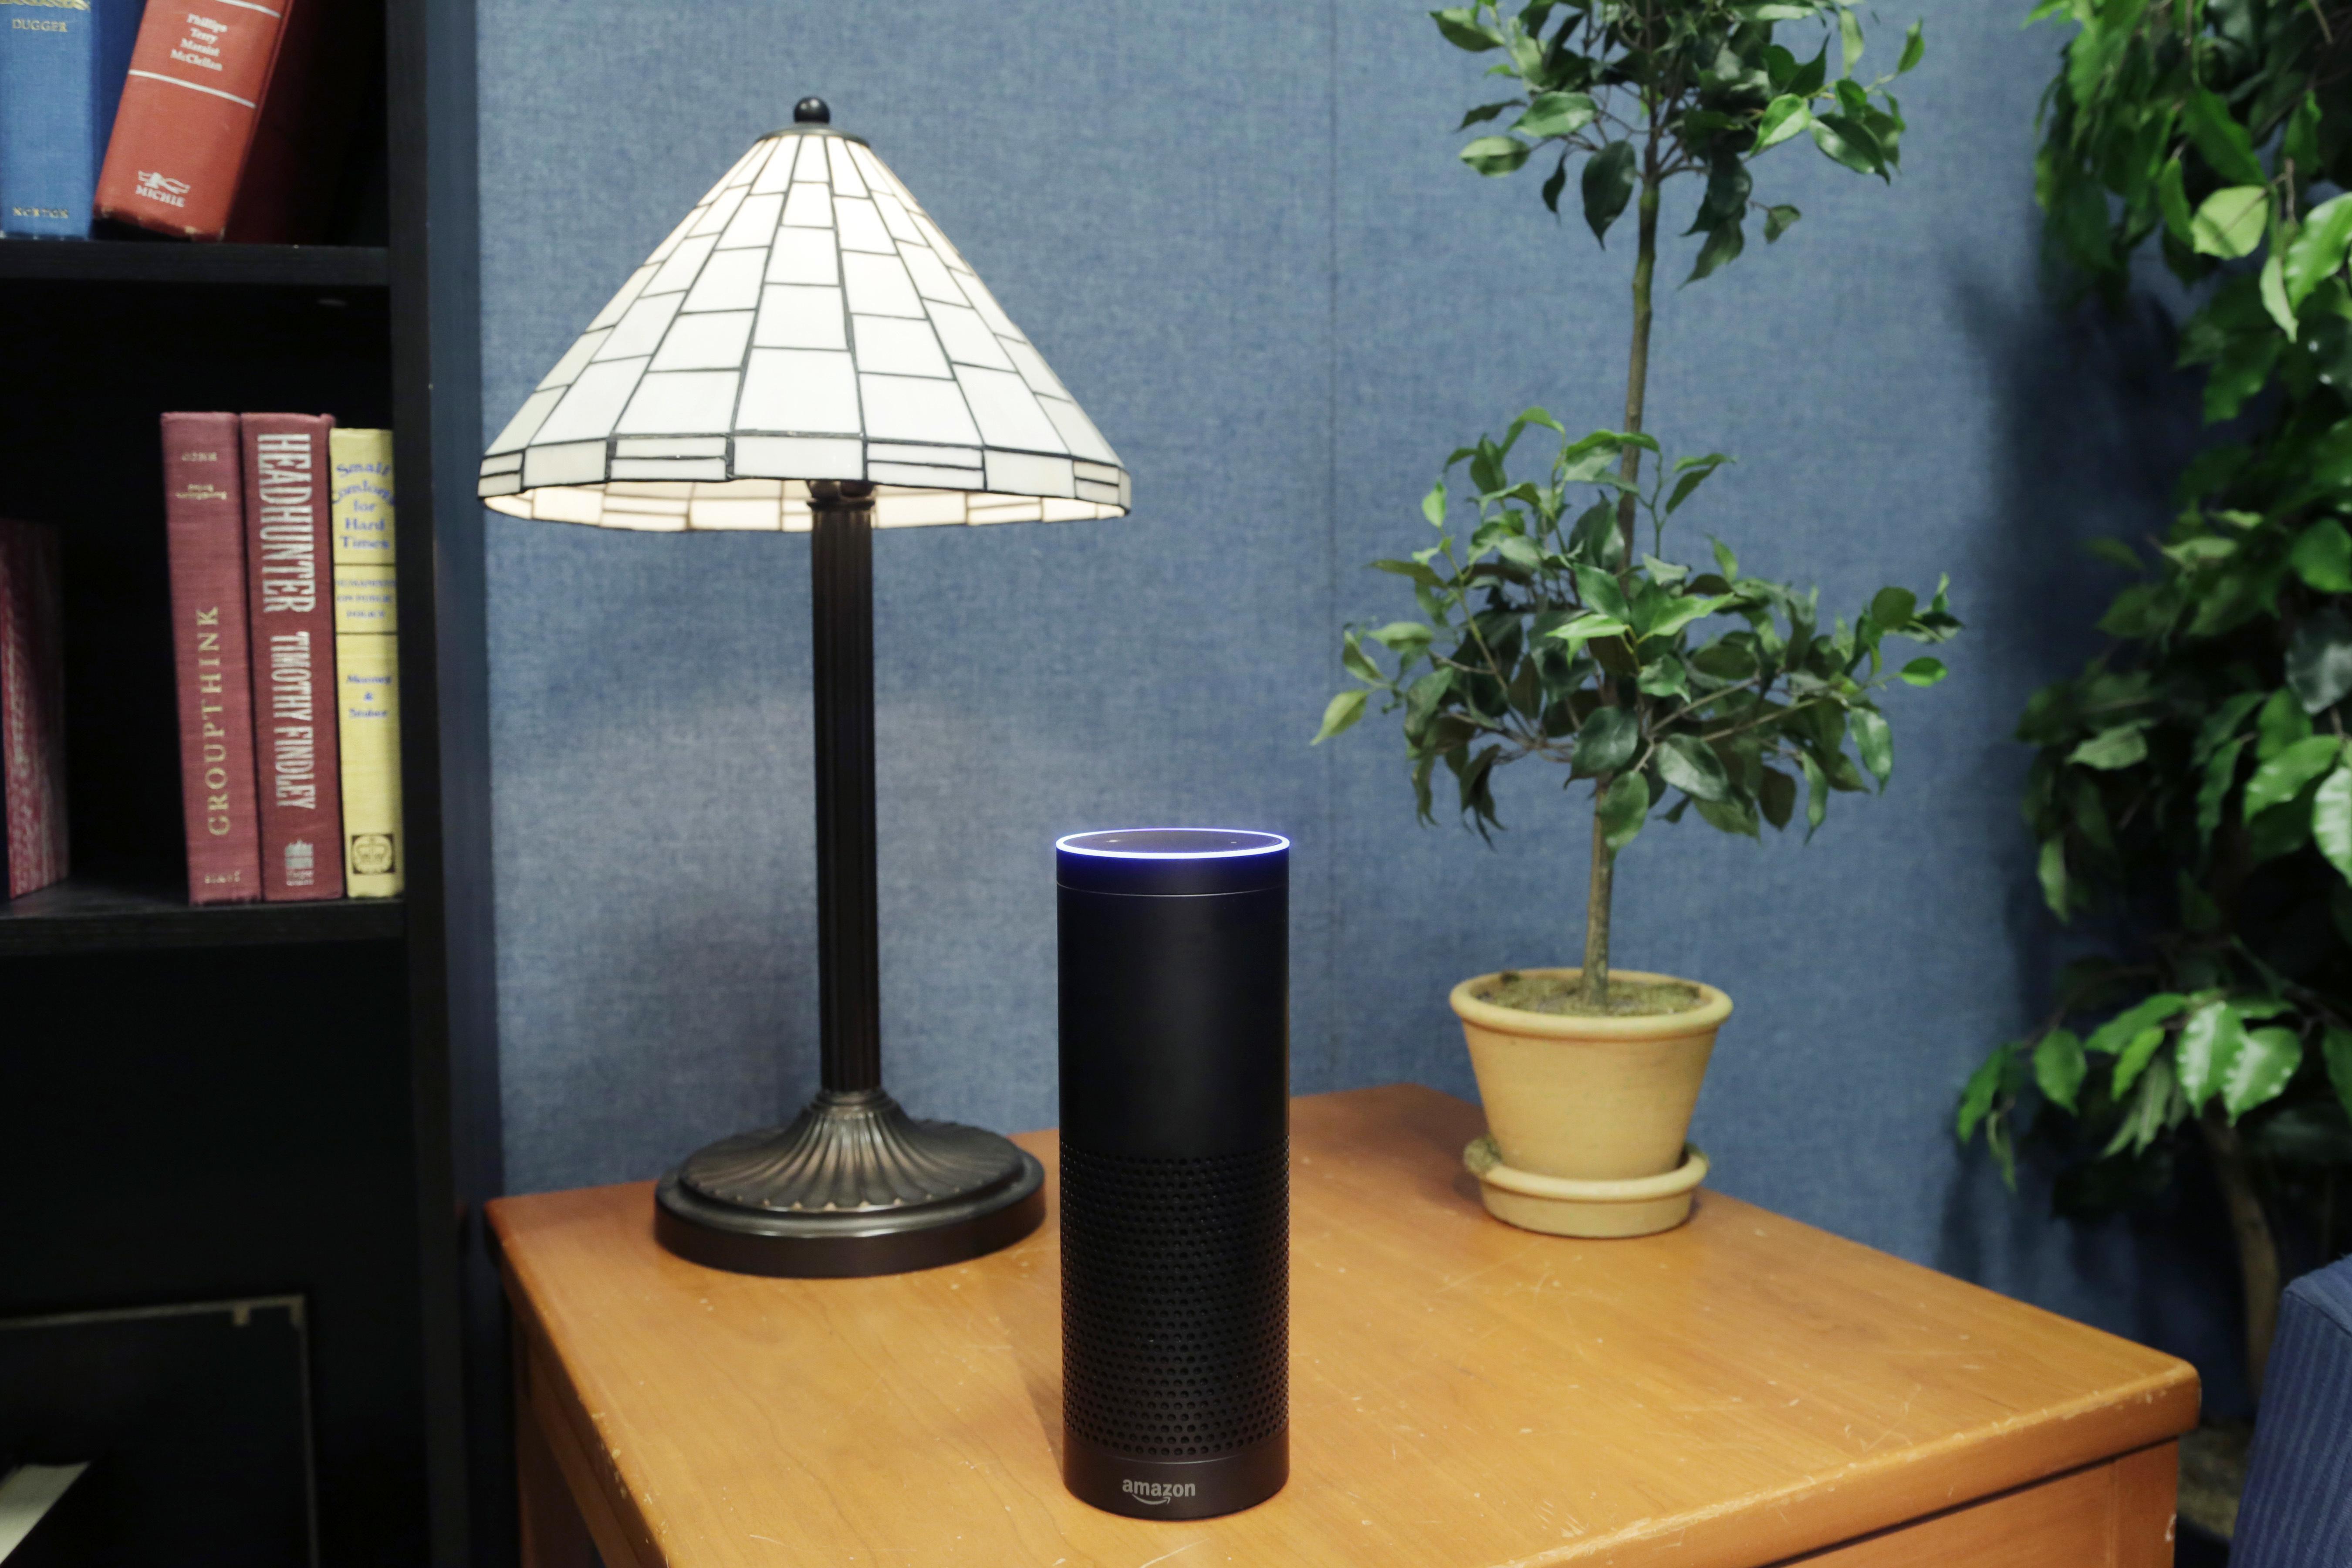 An Amazon Echo on a table.